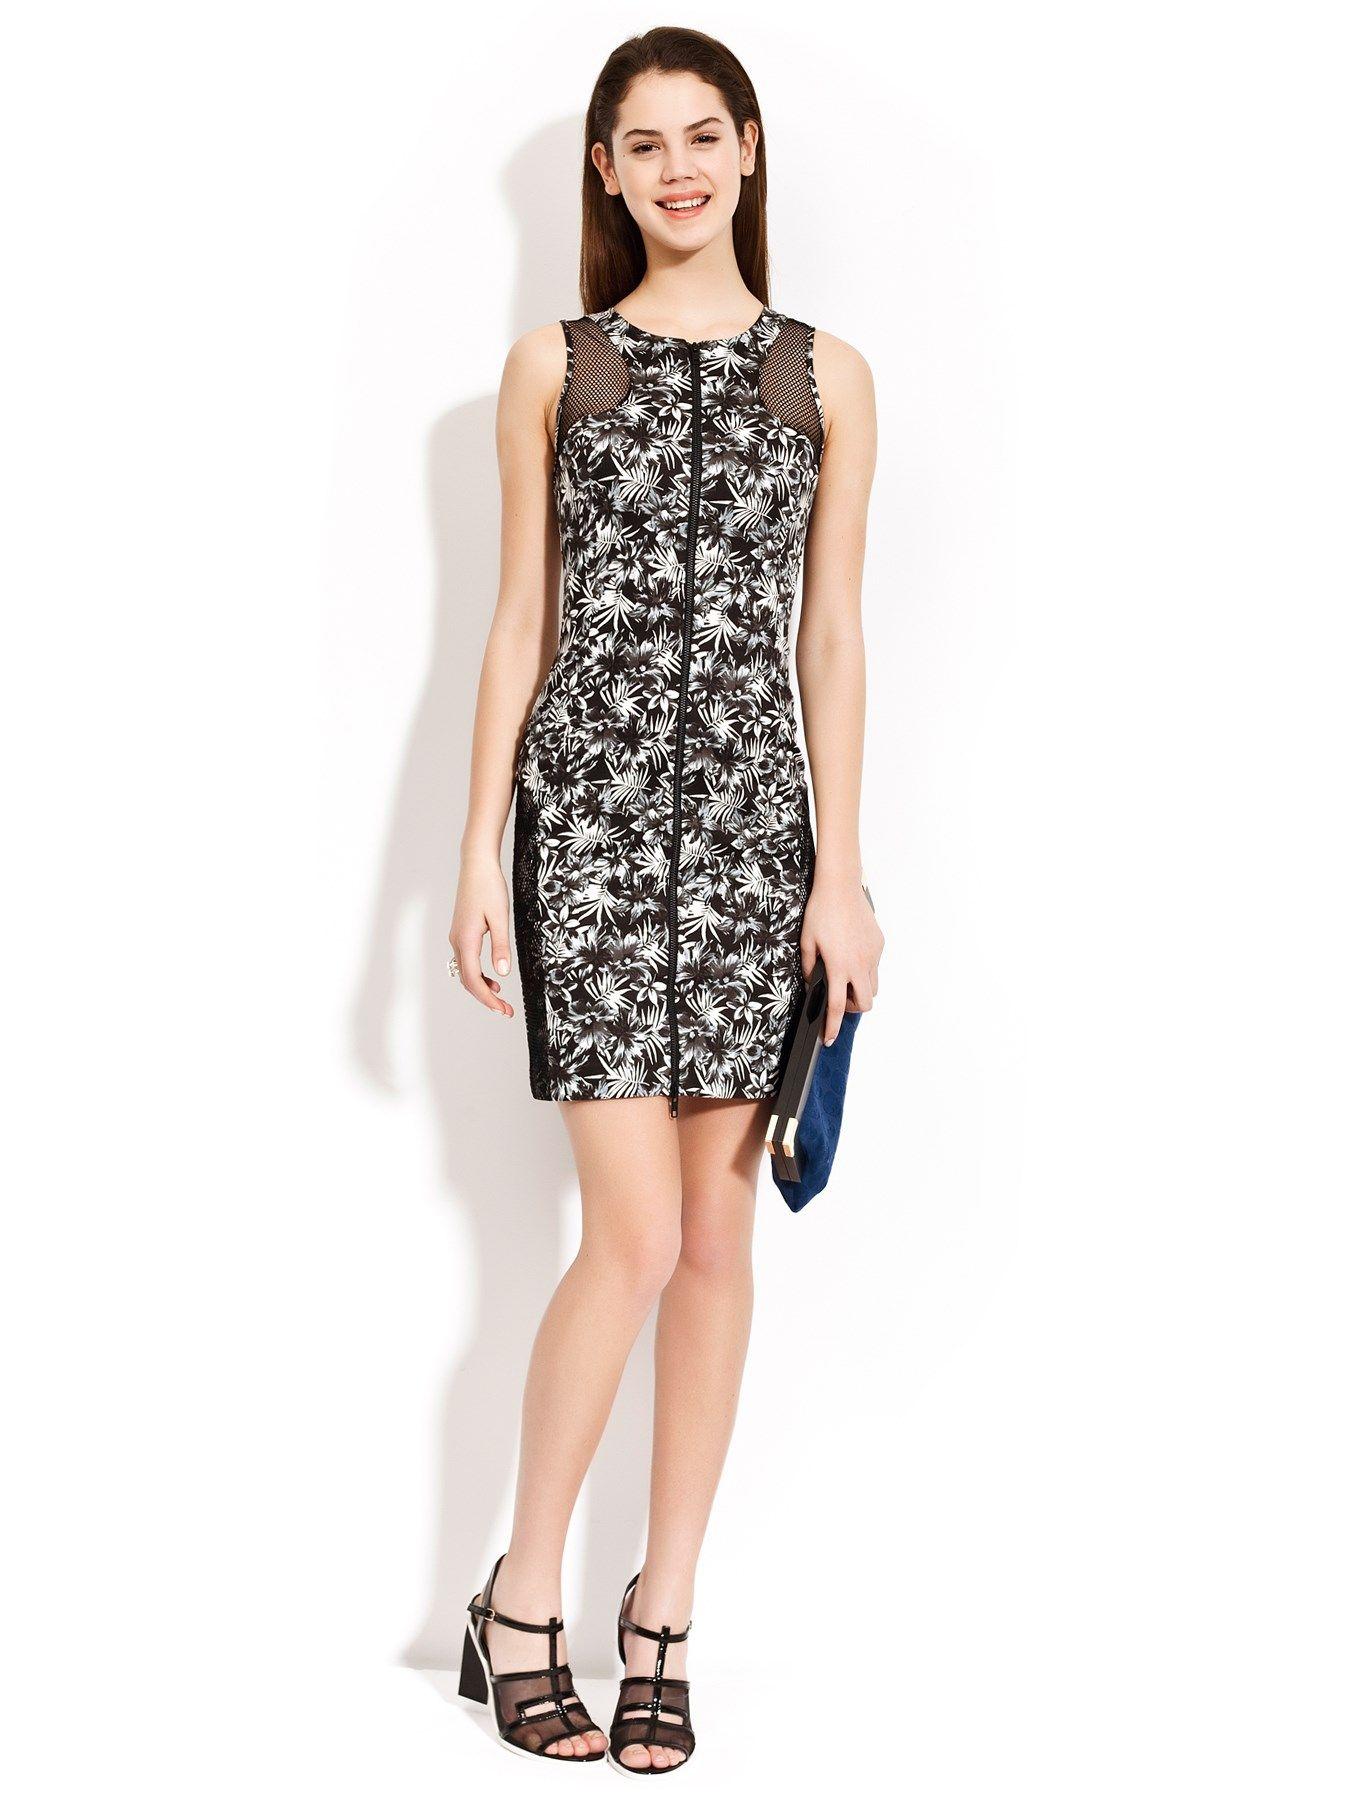 Onden Fermuarli Kisa Elbise Koleksiyon Ust Giyim Elbise Twist Pelin S Style Picks Dresses Formal Dresses Fashion